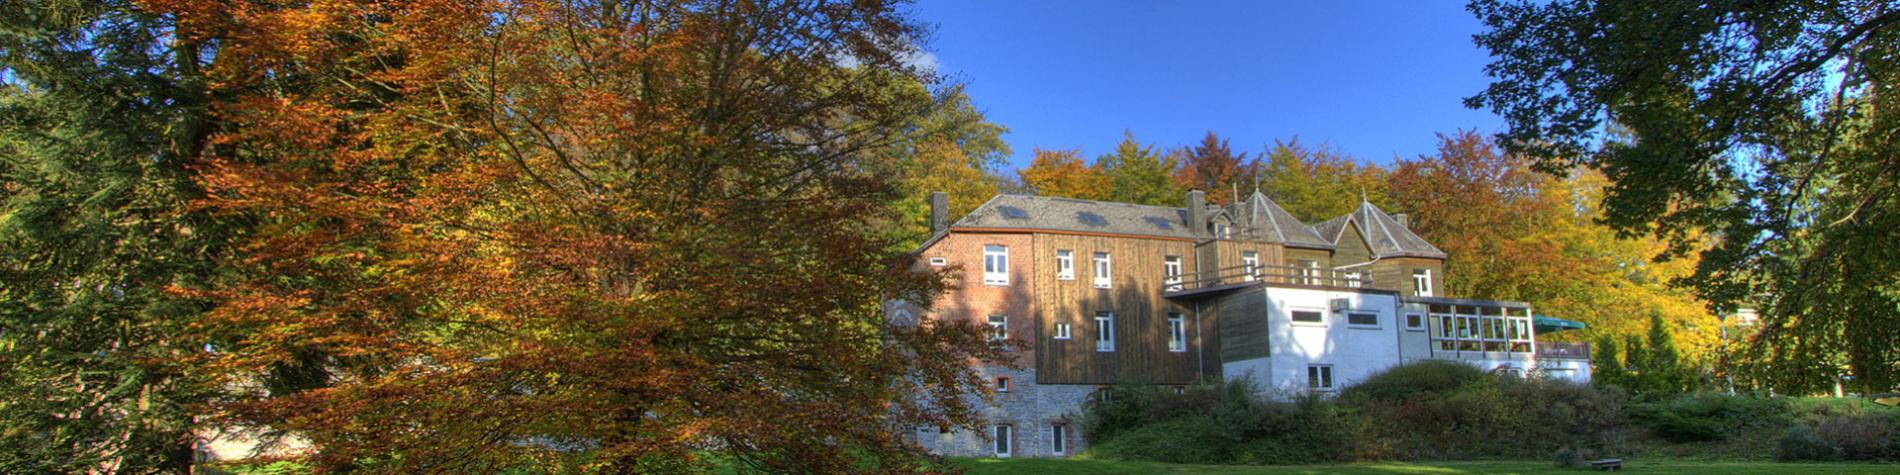 Hôtel - Parkhôtel - Villa - Vielsalm